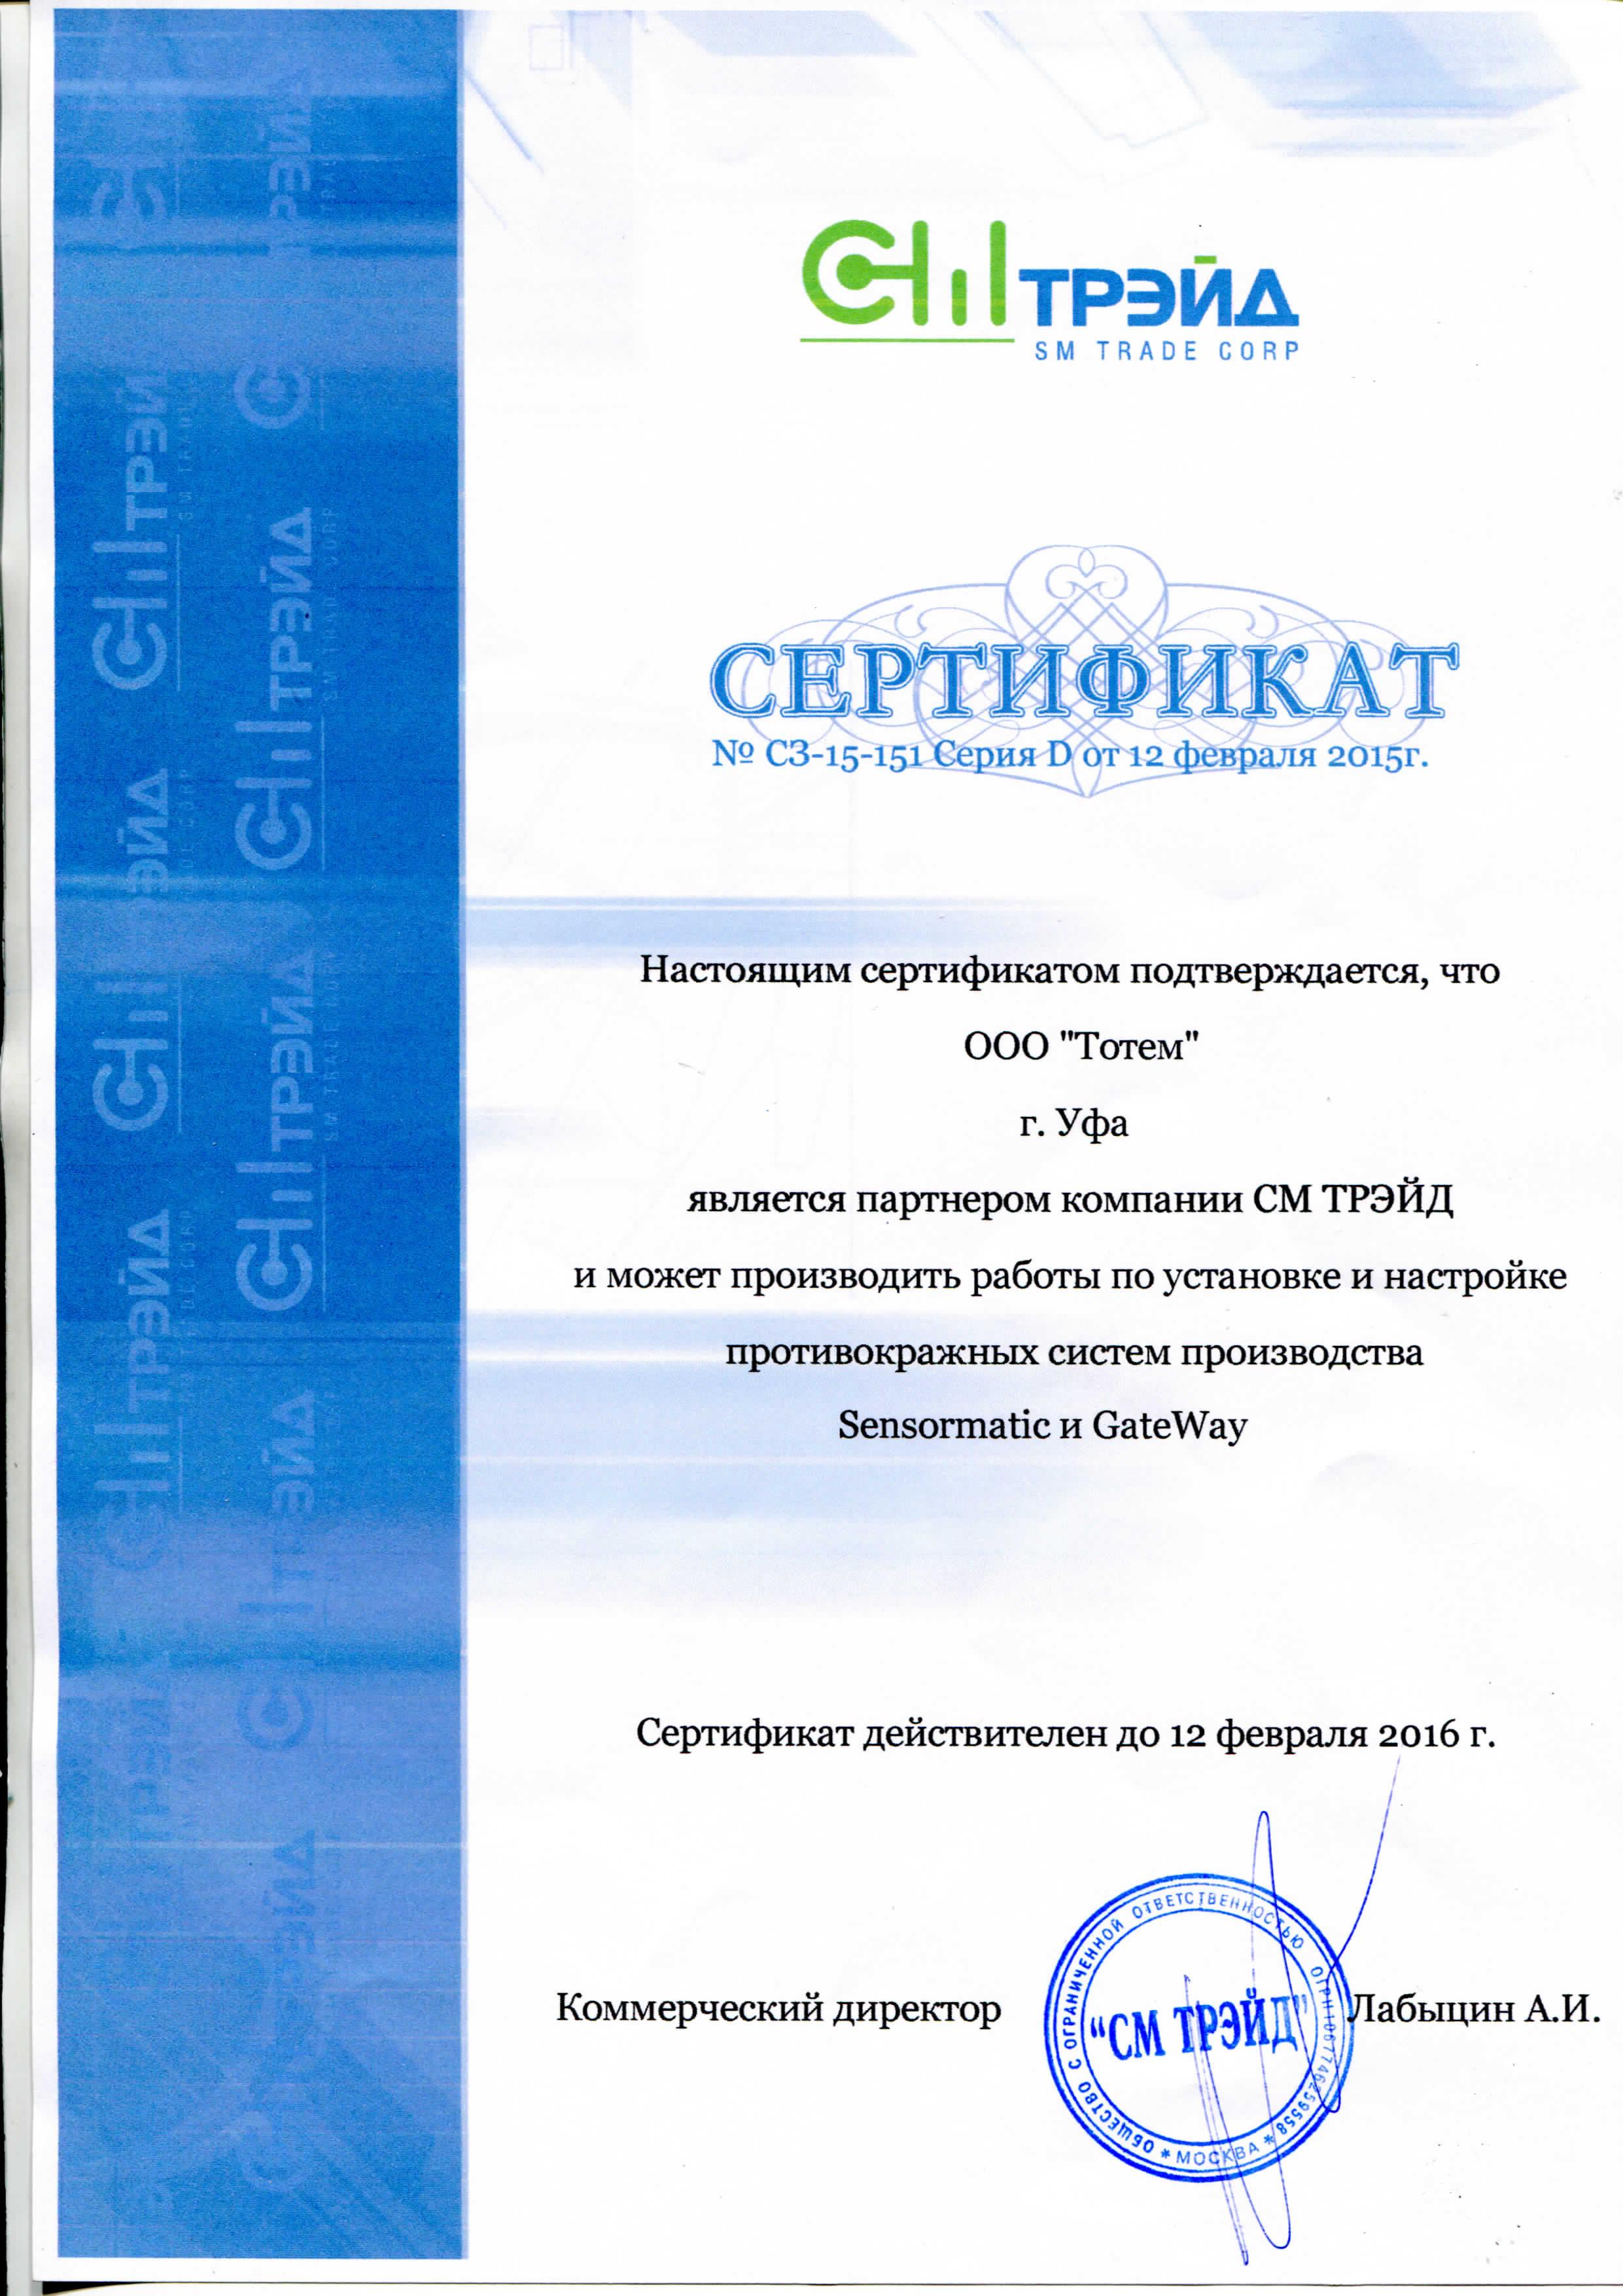 Сертификат_СМ_Трейд.jpg